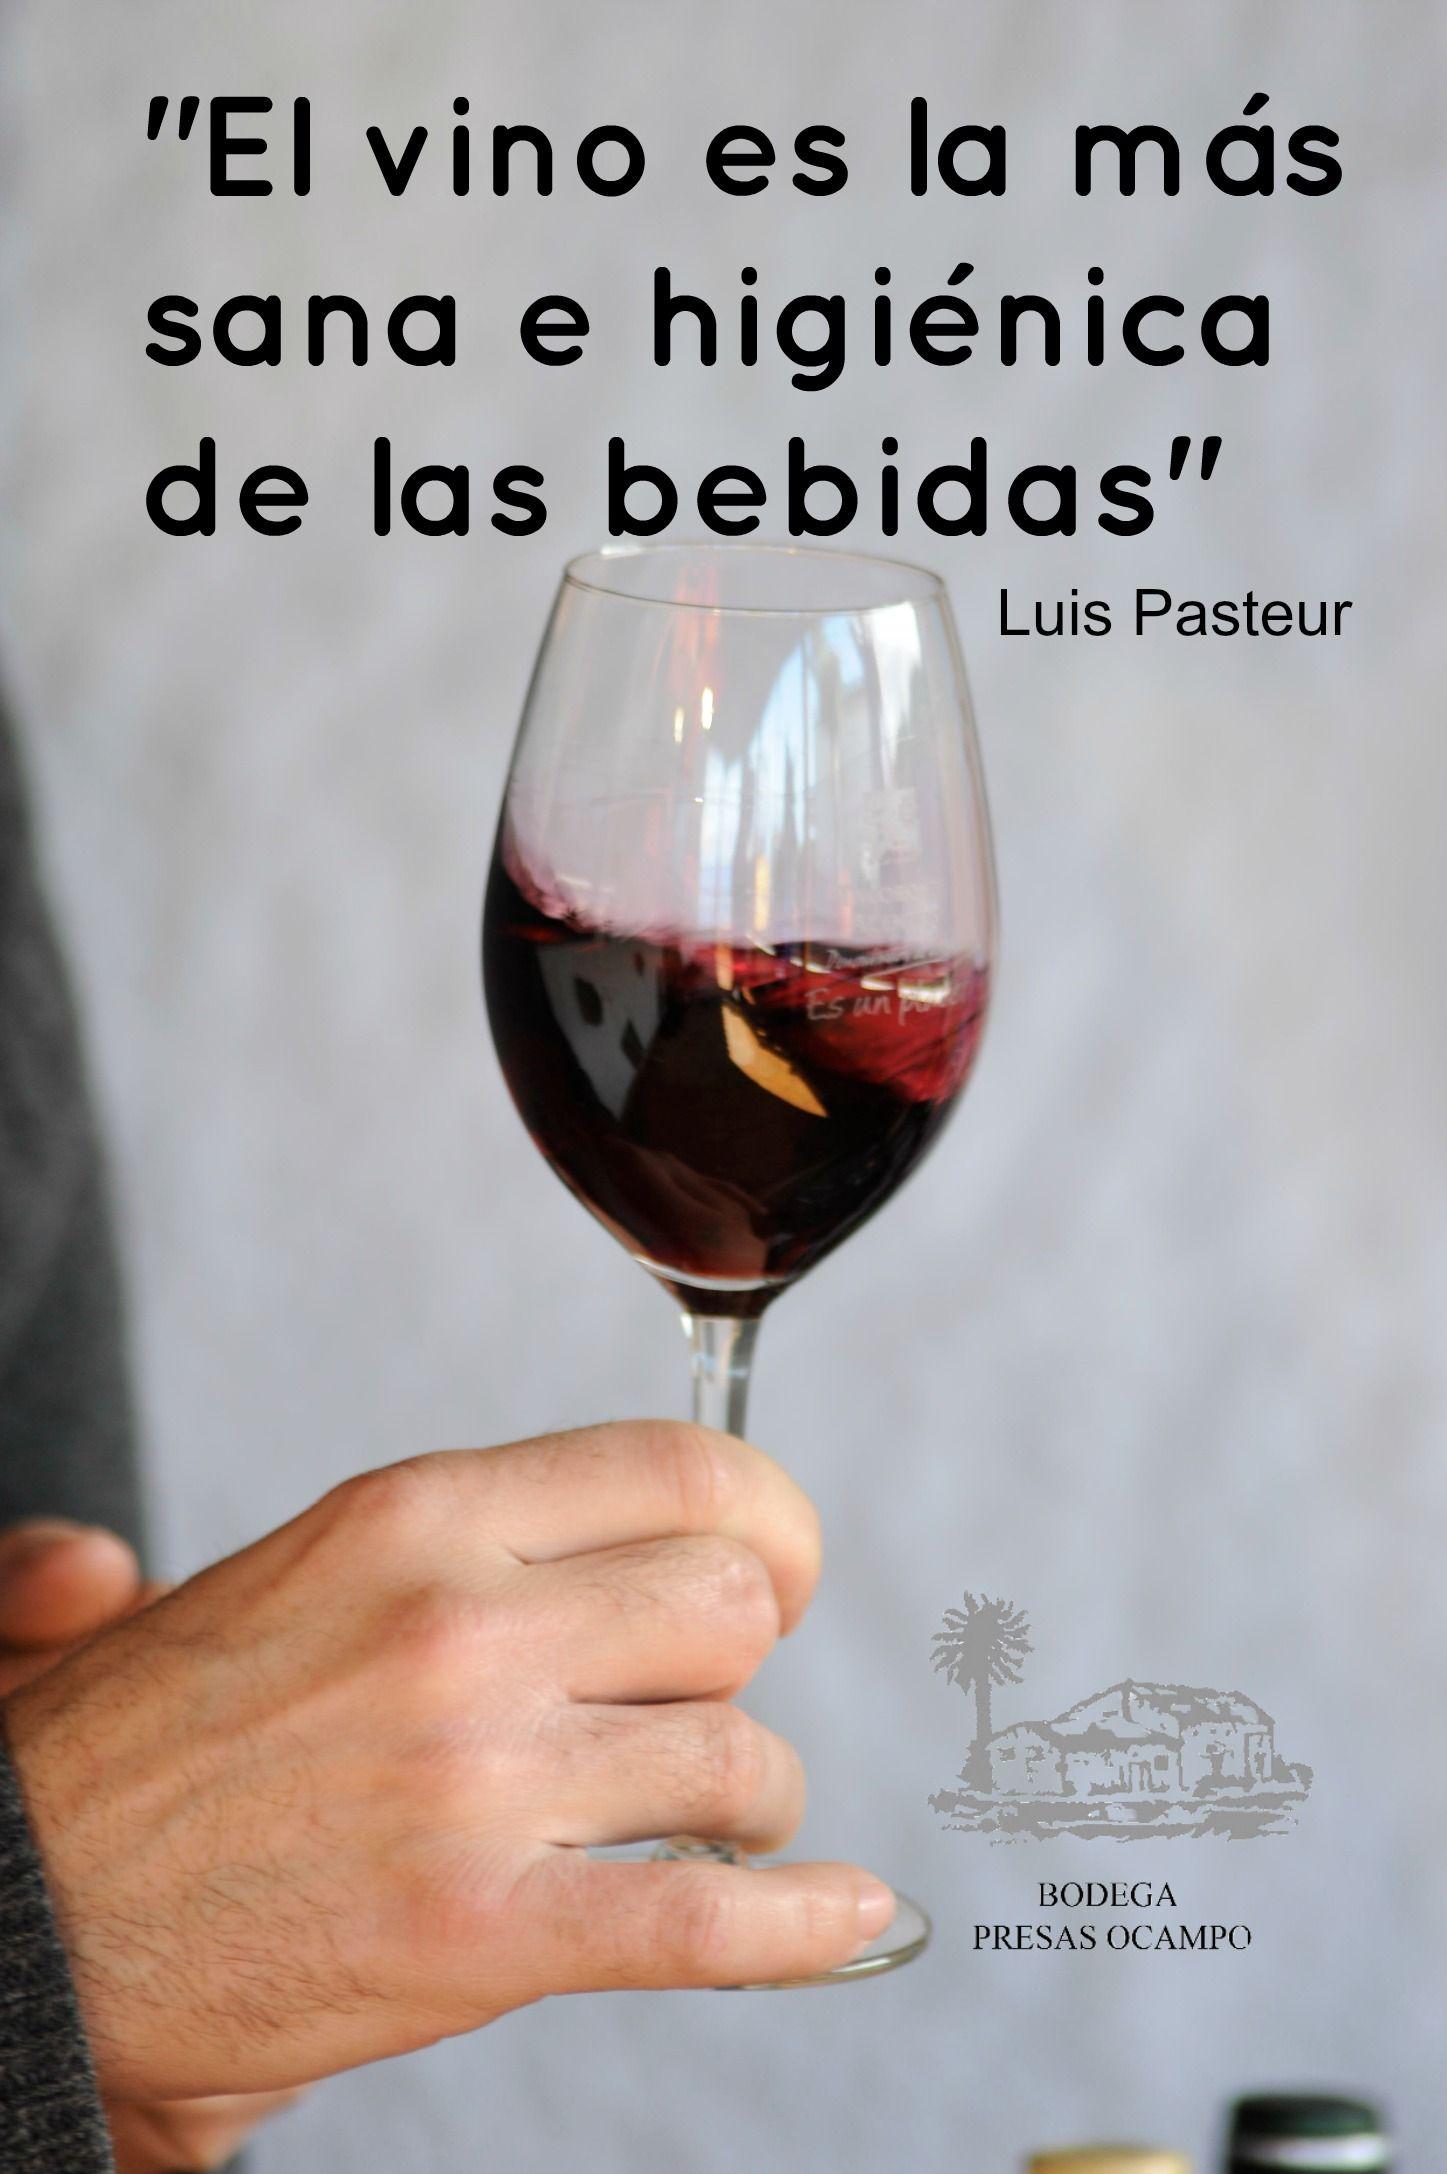 Frases De Vinos Vinosdetenerife Vinos Vinos Frases Y